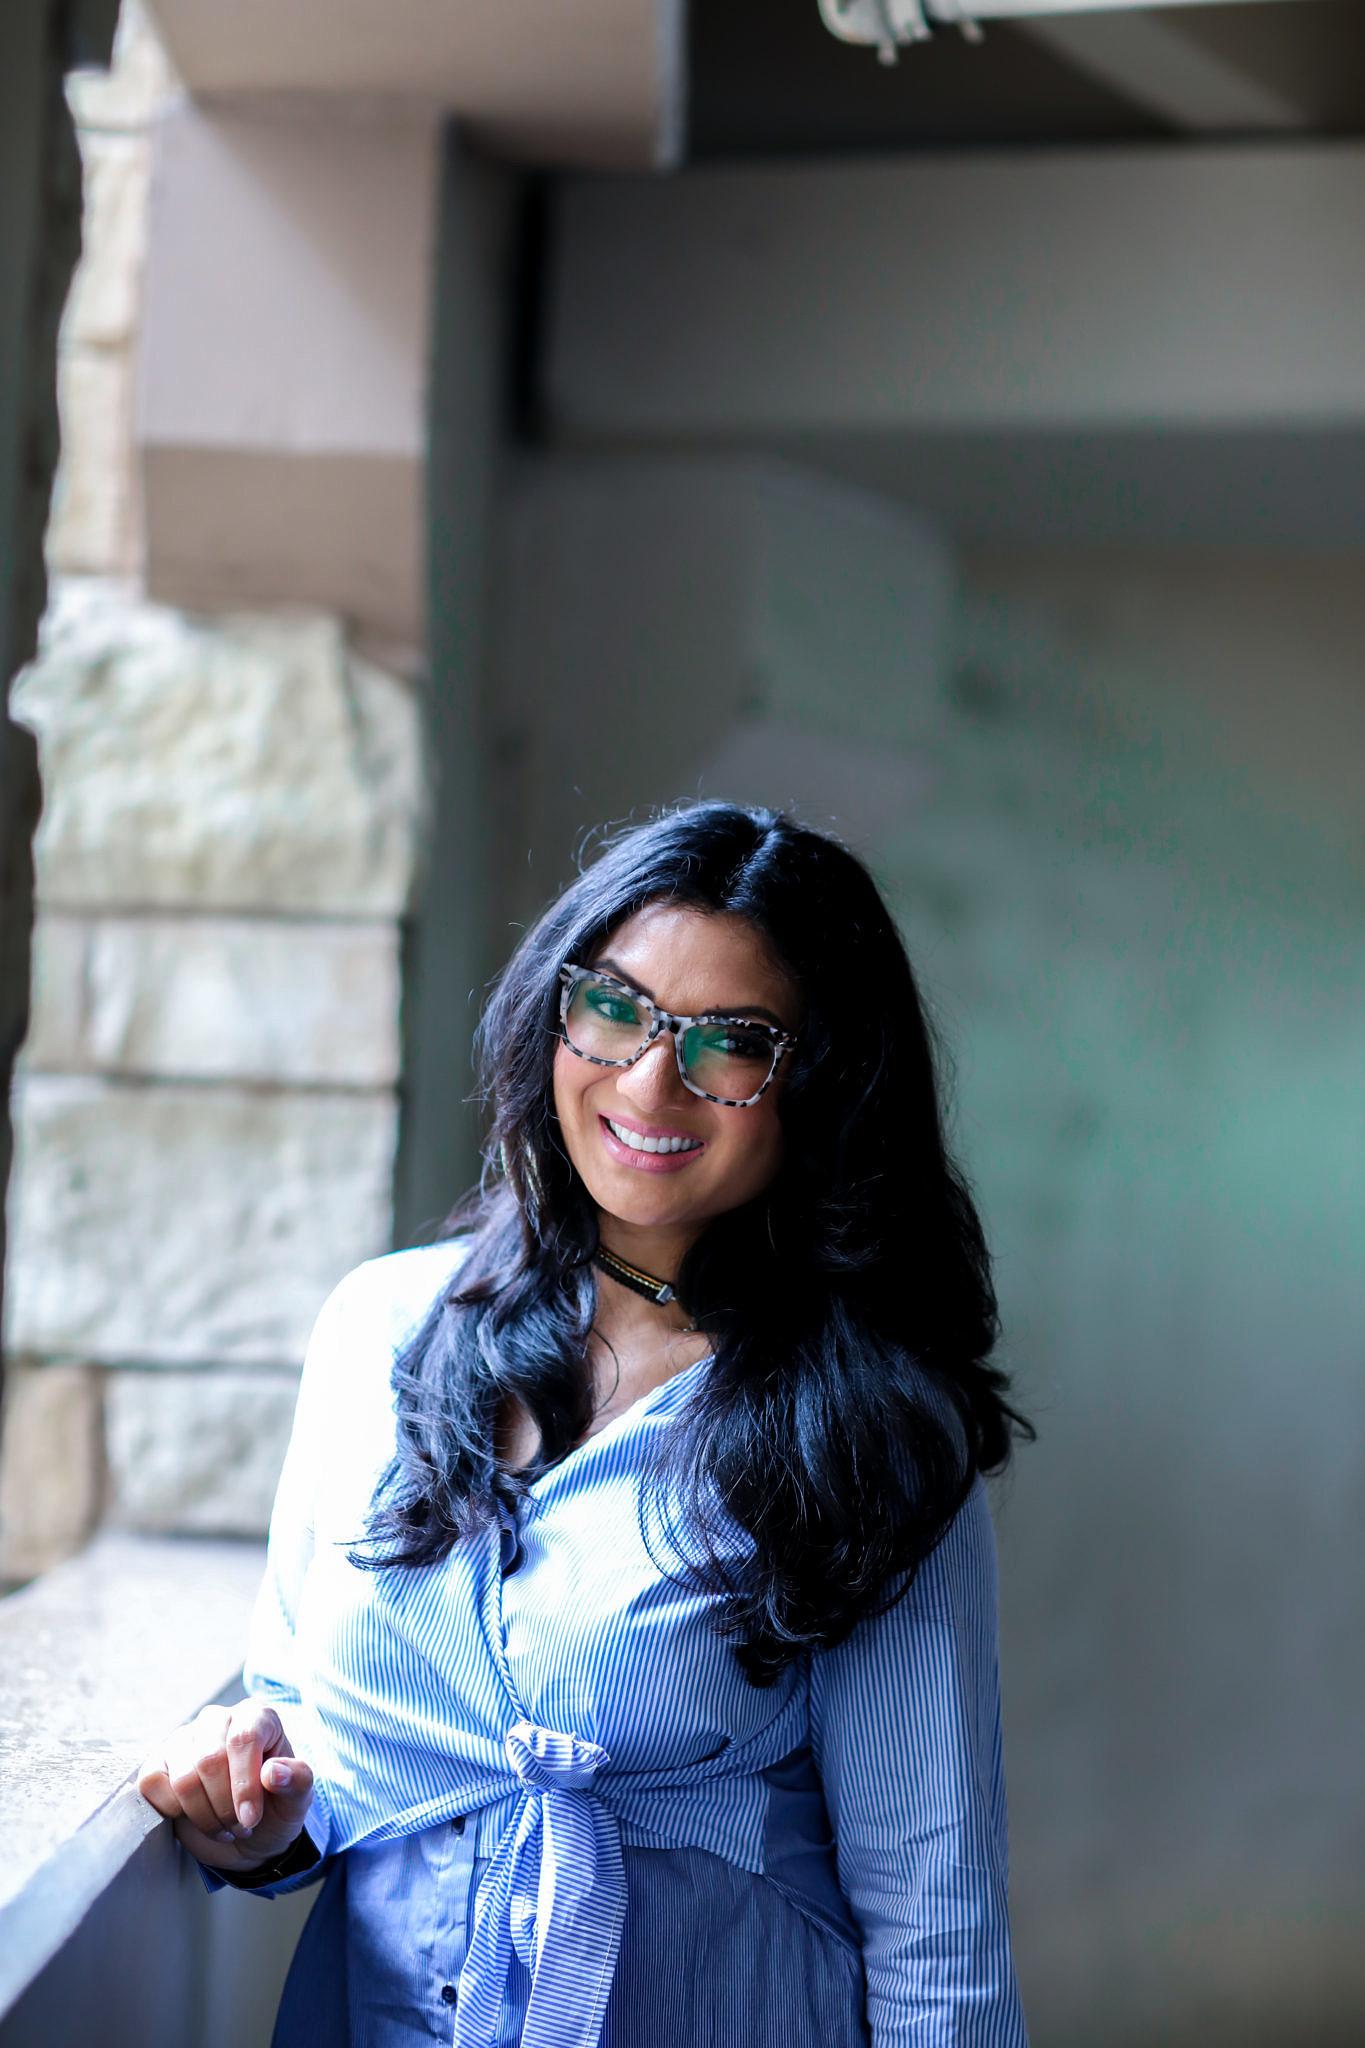 Build Your Eyeglasses Wardrobe